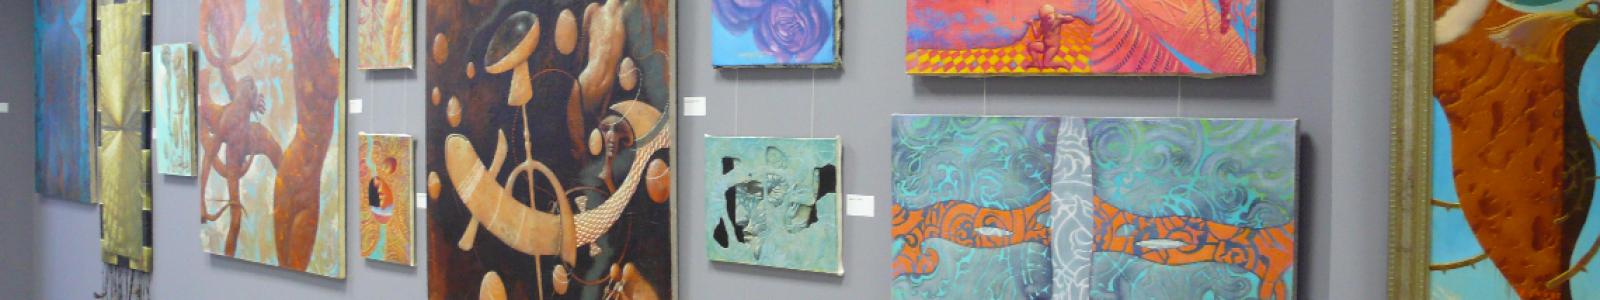 Gallery Painter Nikodim Leibham